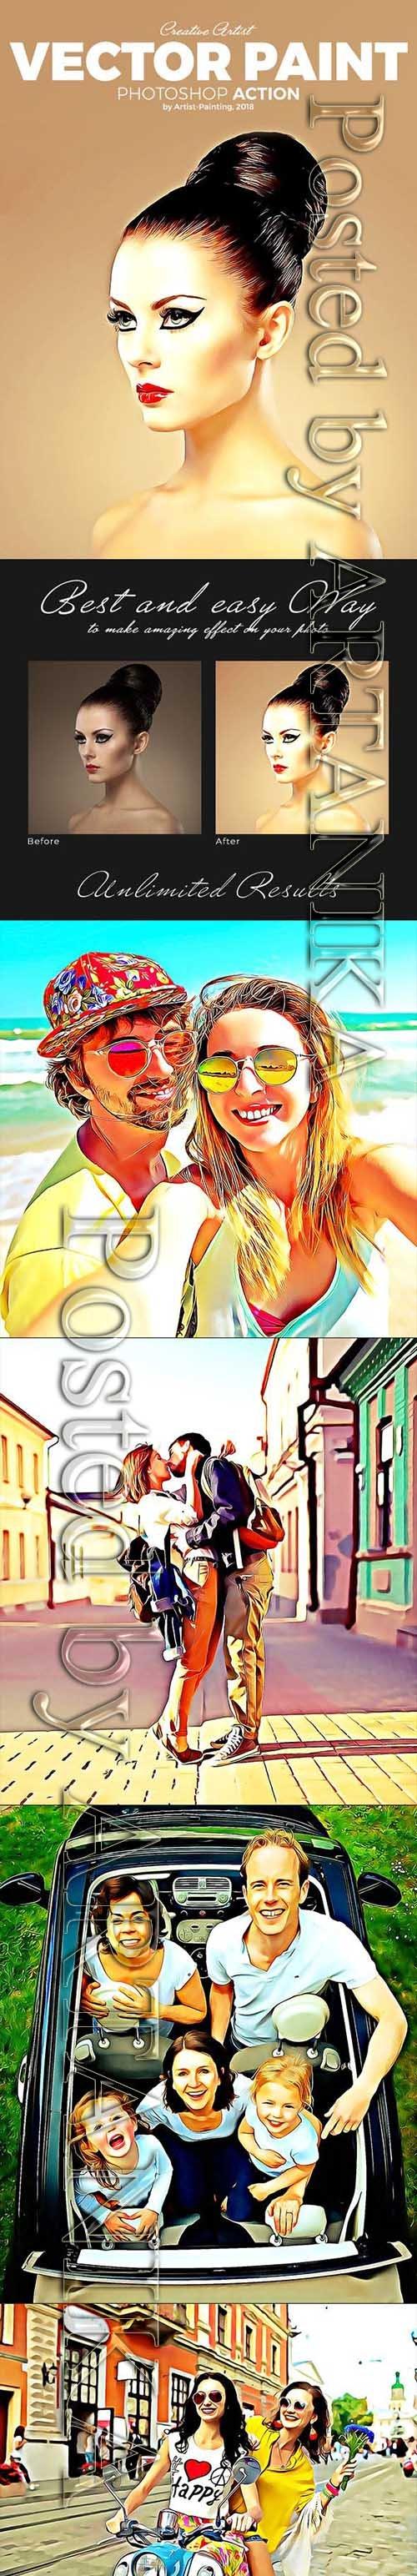 Graphicriver - Vector Paint Photoshop Action 21282262